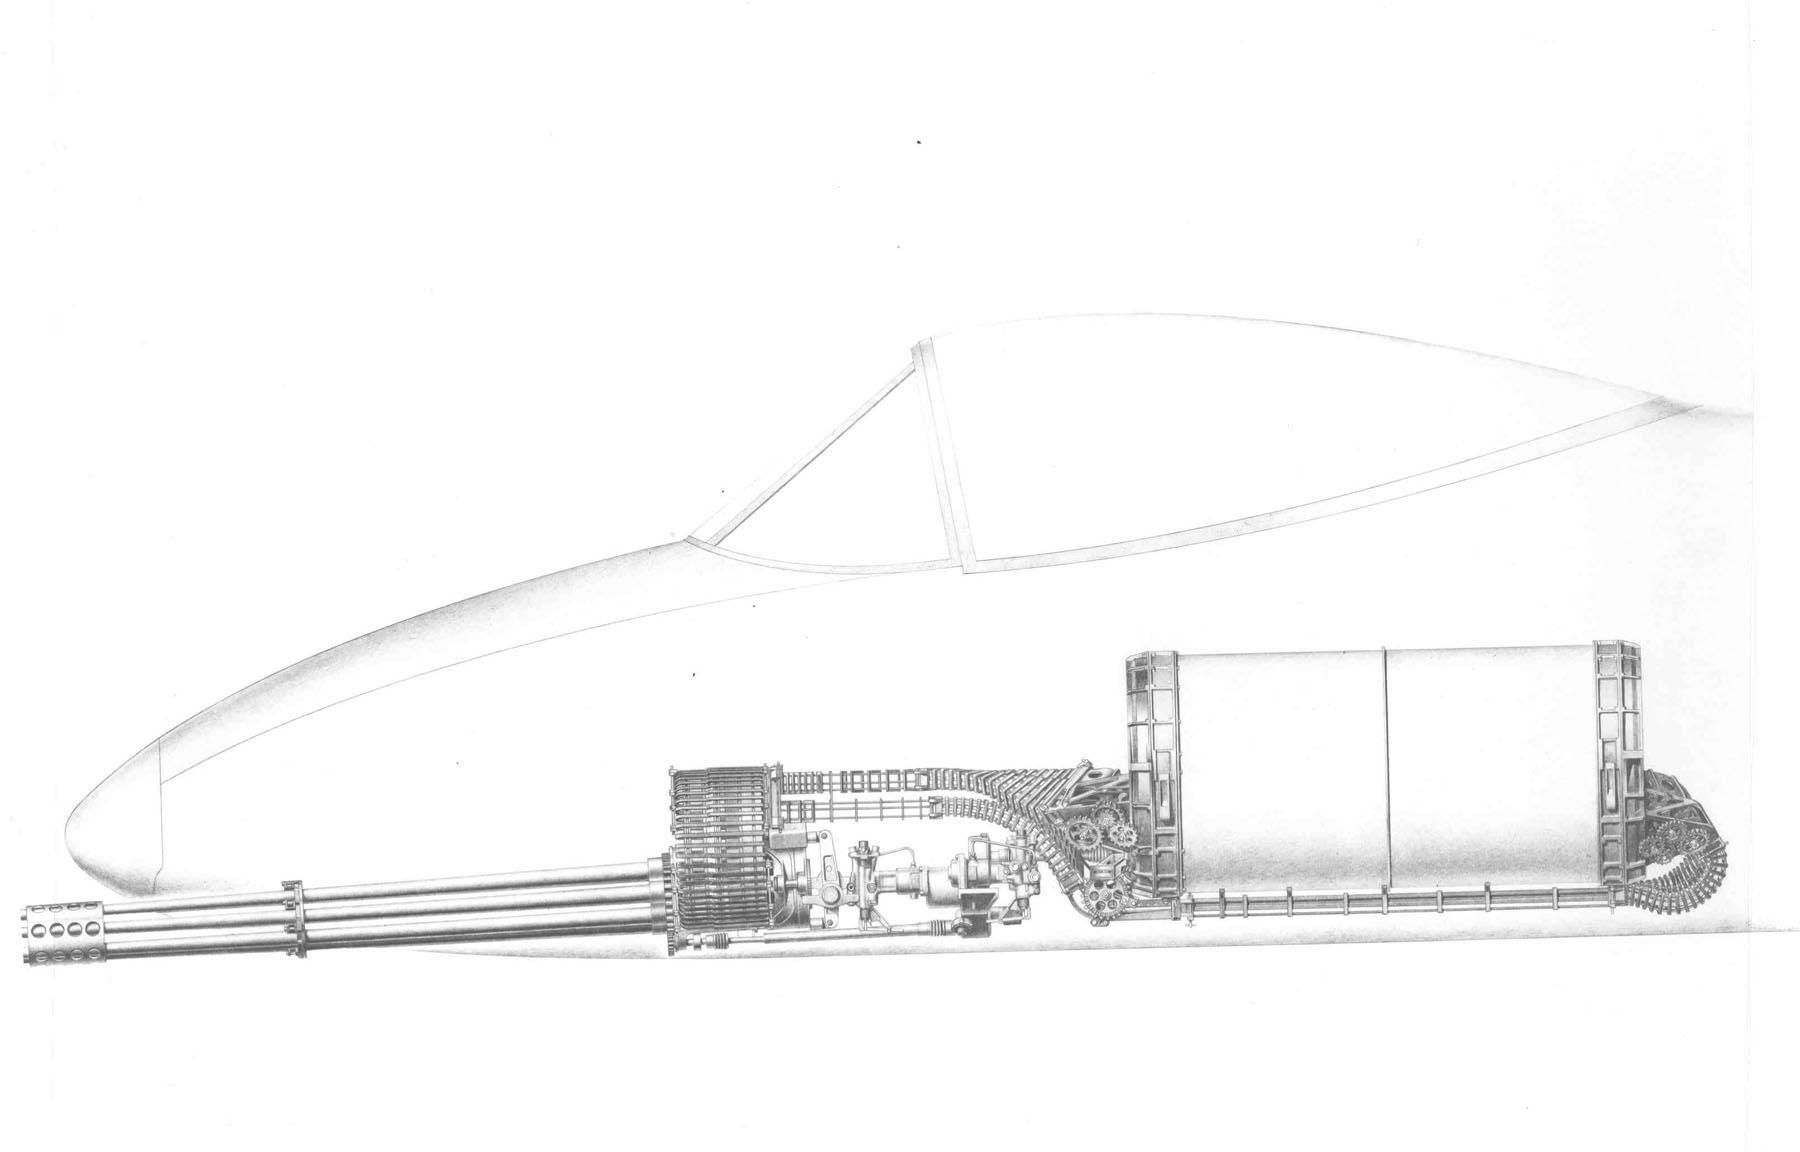 http://upload.wikimedia.org/wikipedia/commons/b/b3/GAU-10_Drawing.jpg